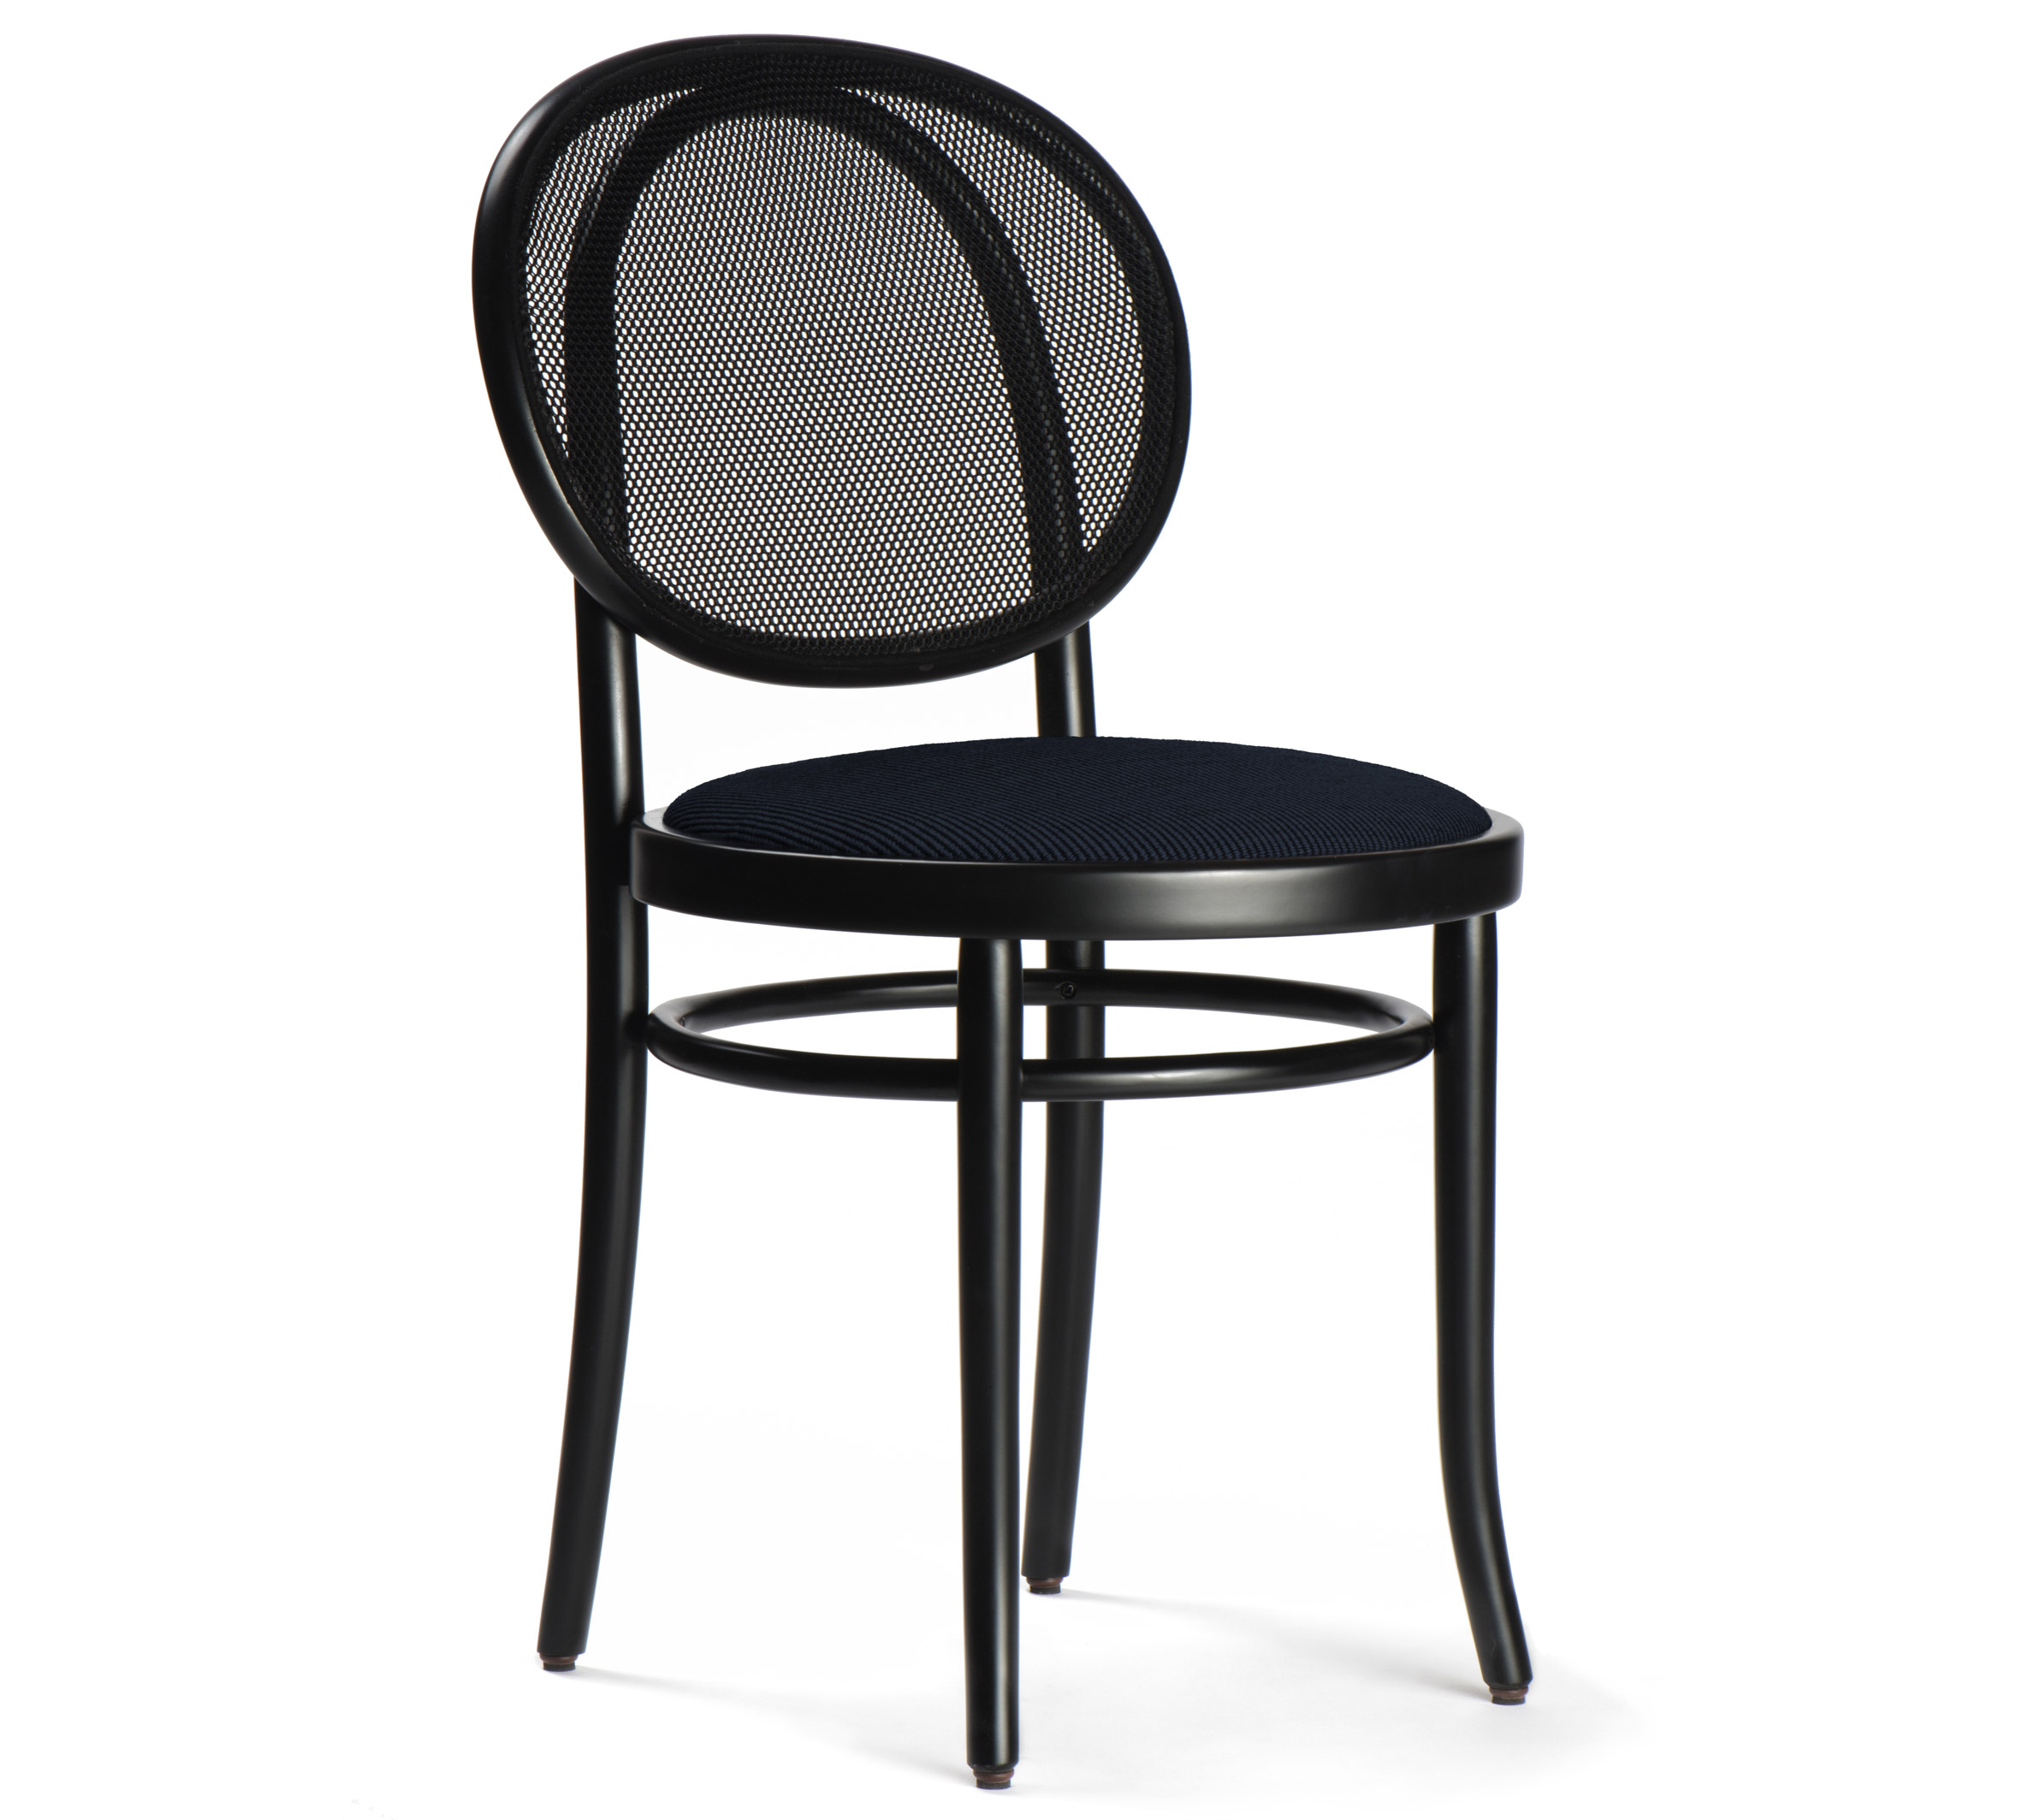 gtv-n0-chair-front-milan-design-week-furniture_dezeen_2364_col_6.jpg